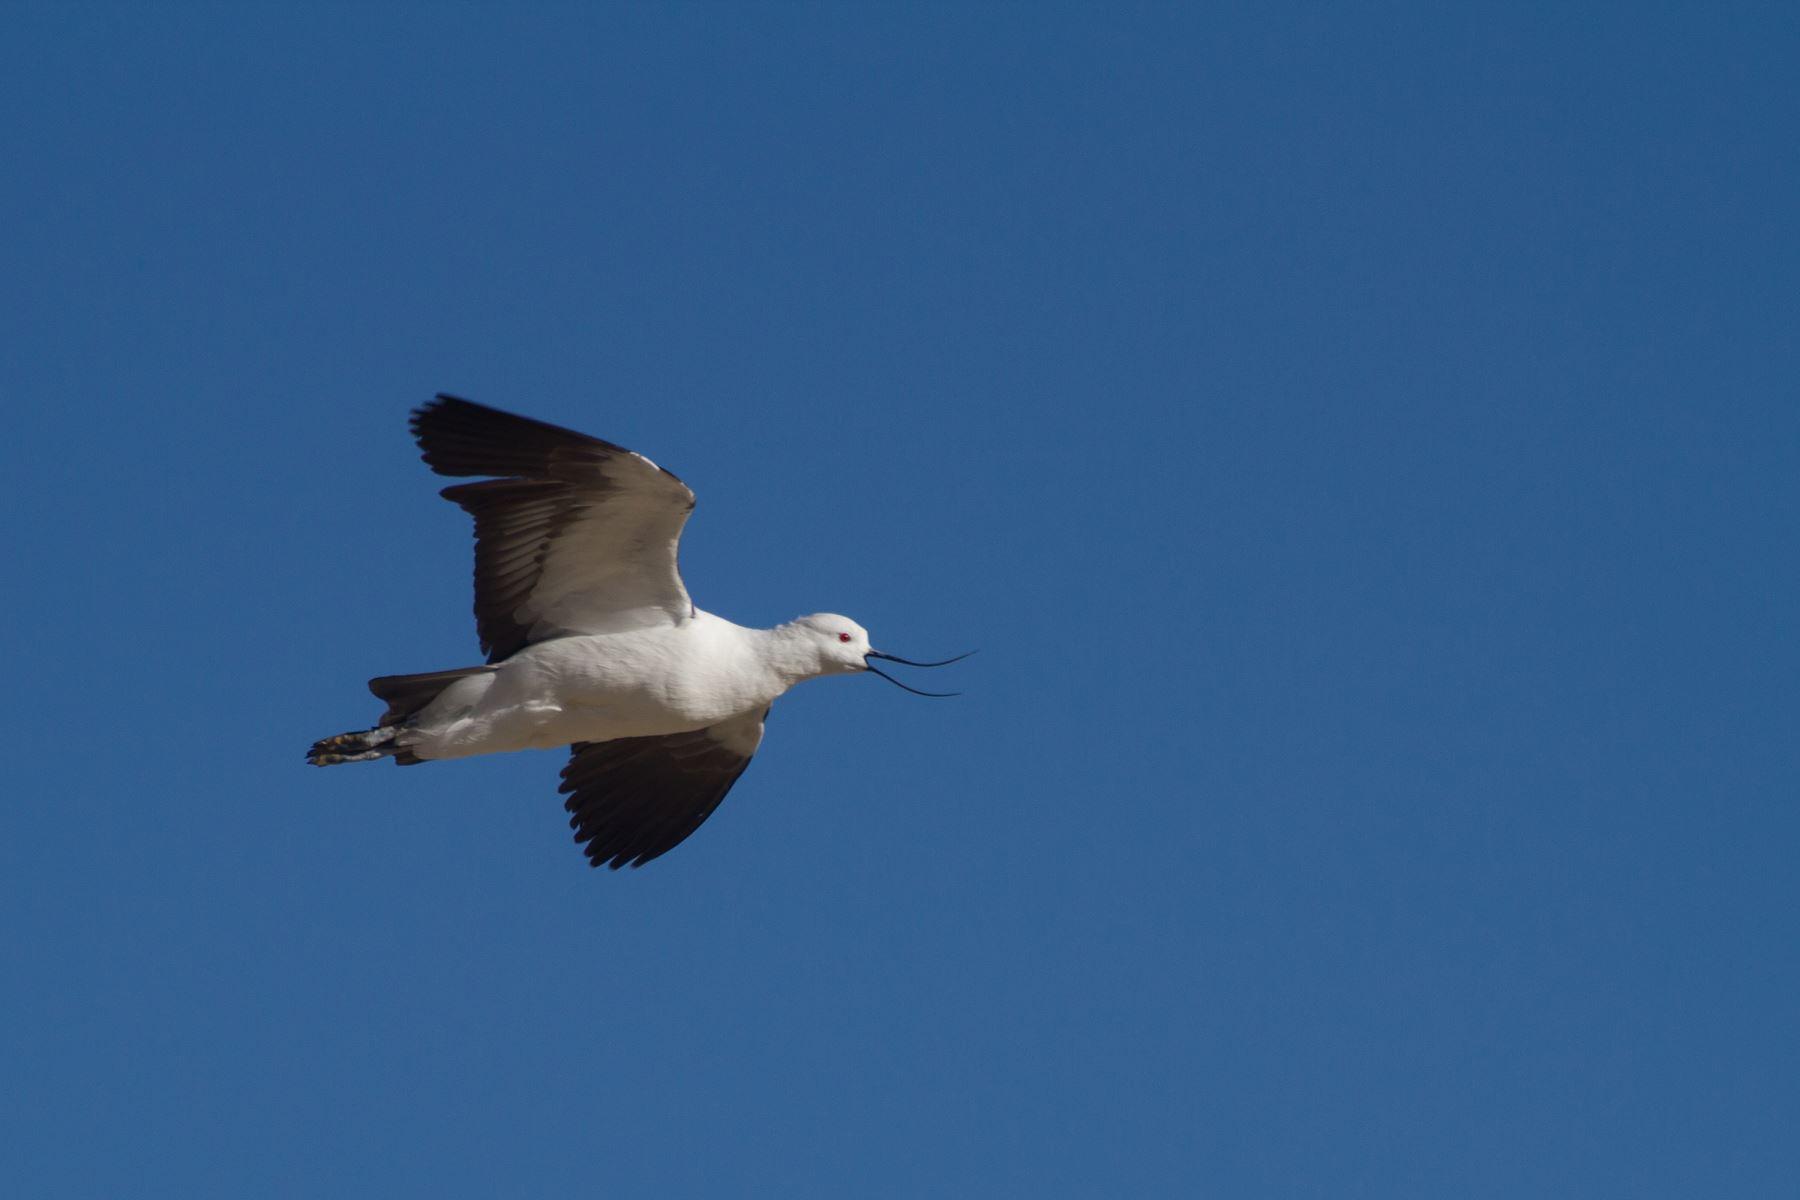 Majestuoso valle arequipeño del Colca alberga 132 aves